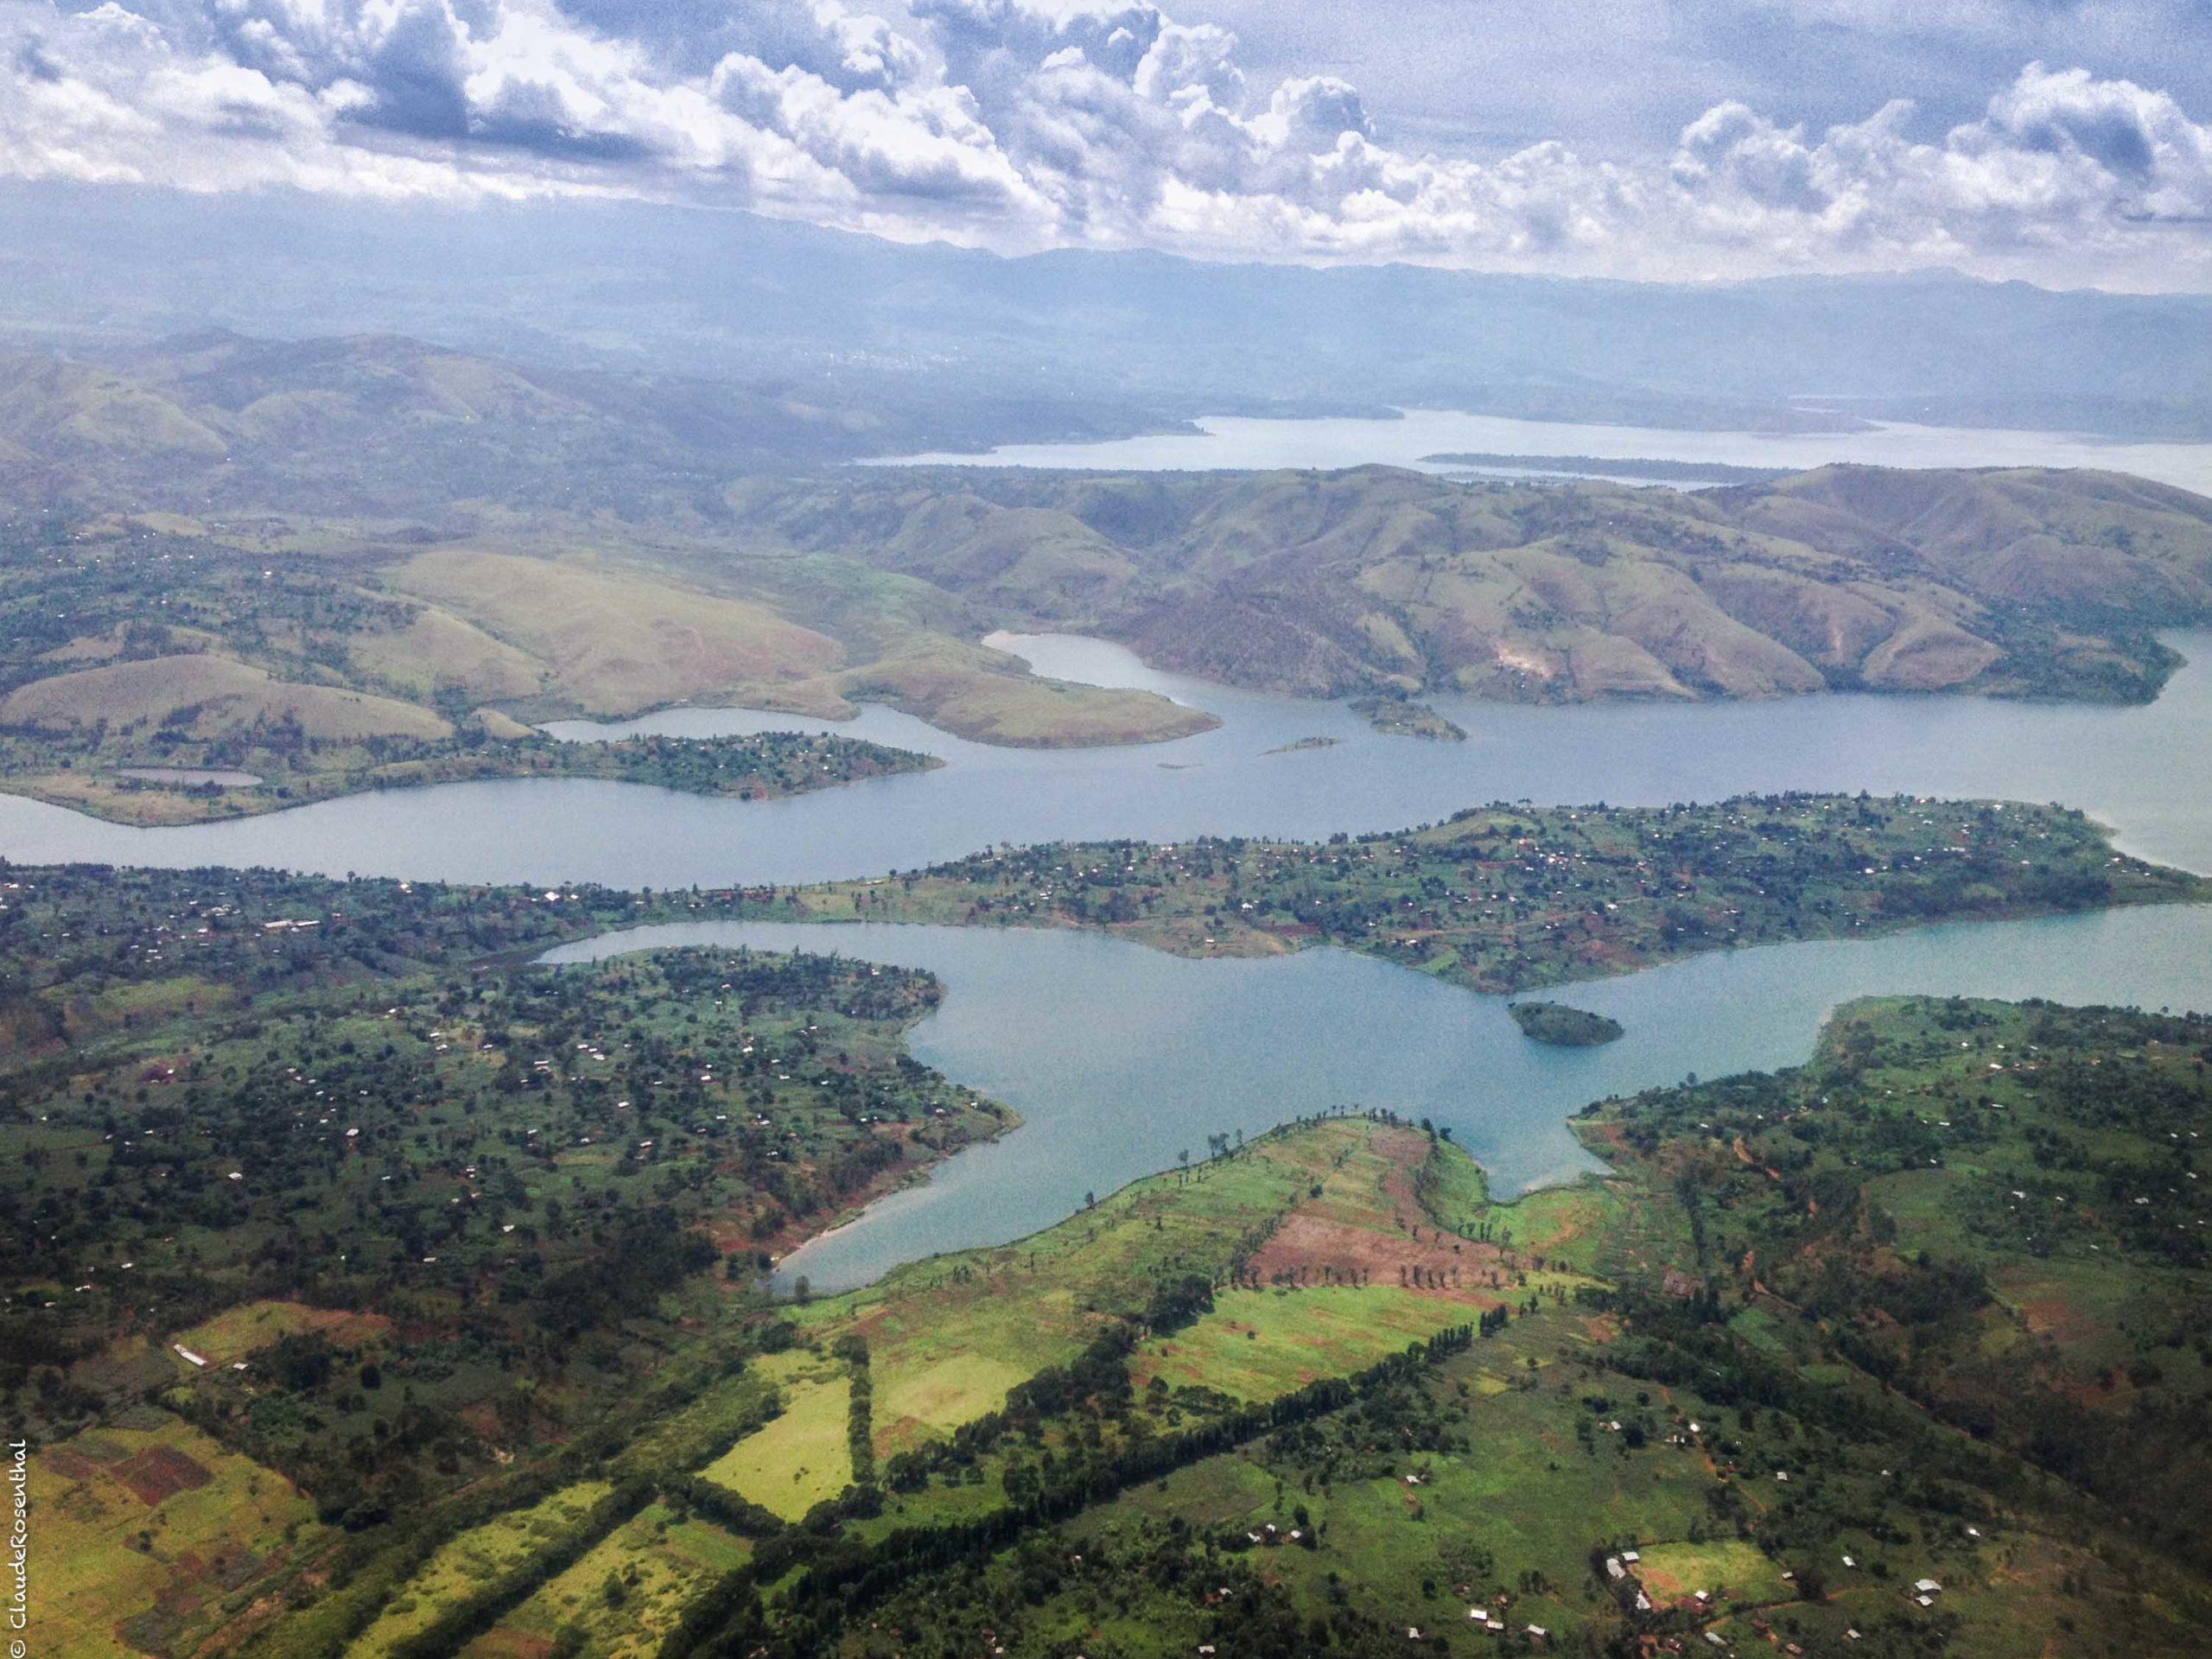 Arrivée sur Bukavu avion 3